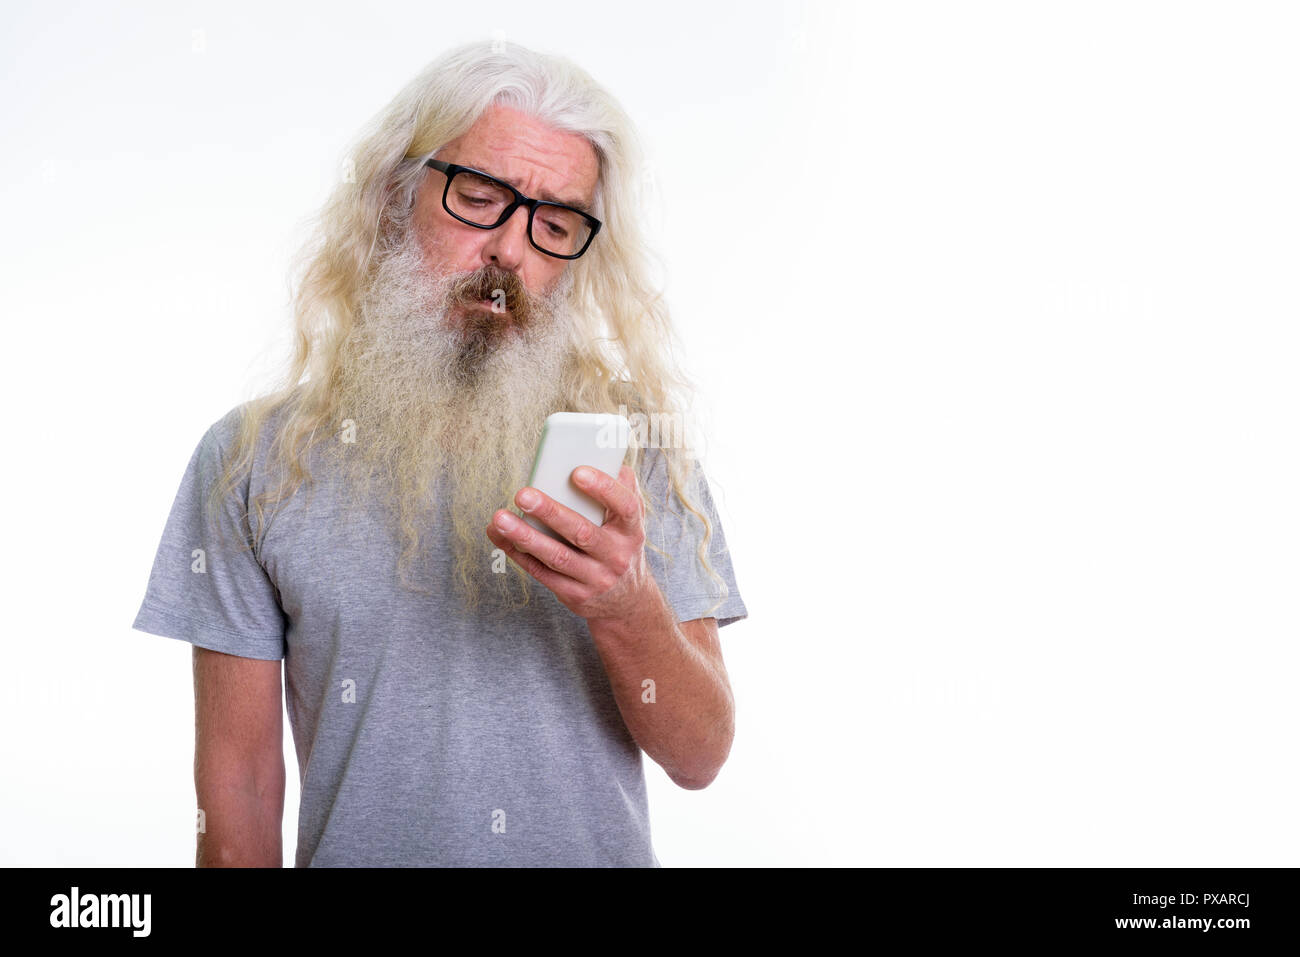 Studio shot of senior bearded man using mobile phone while looki - Stock Image